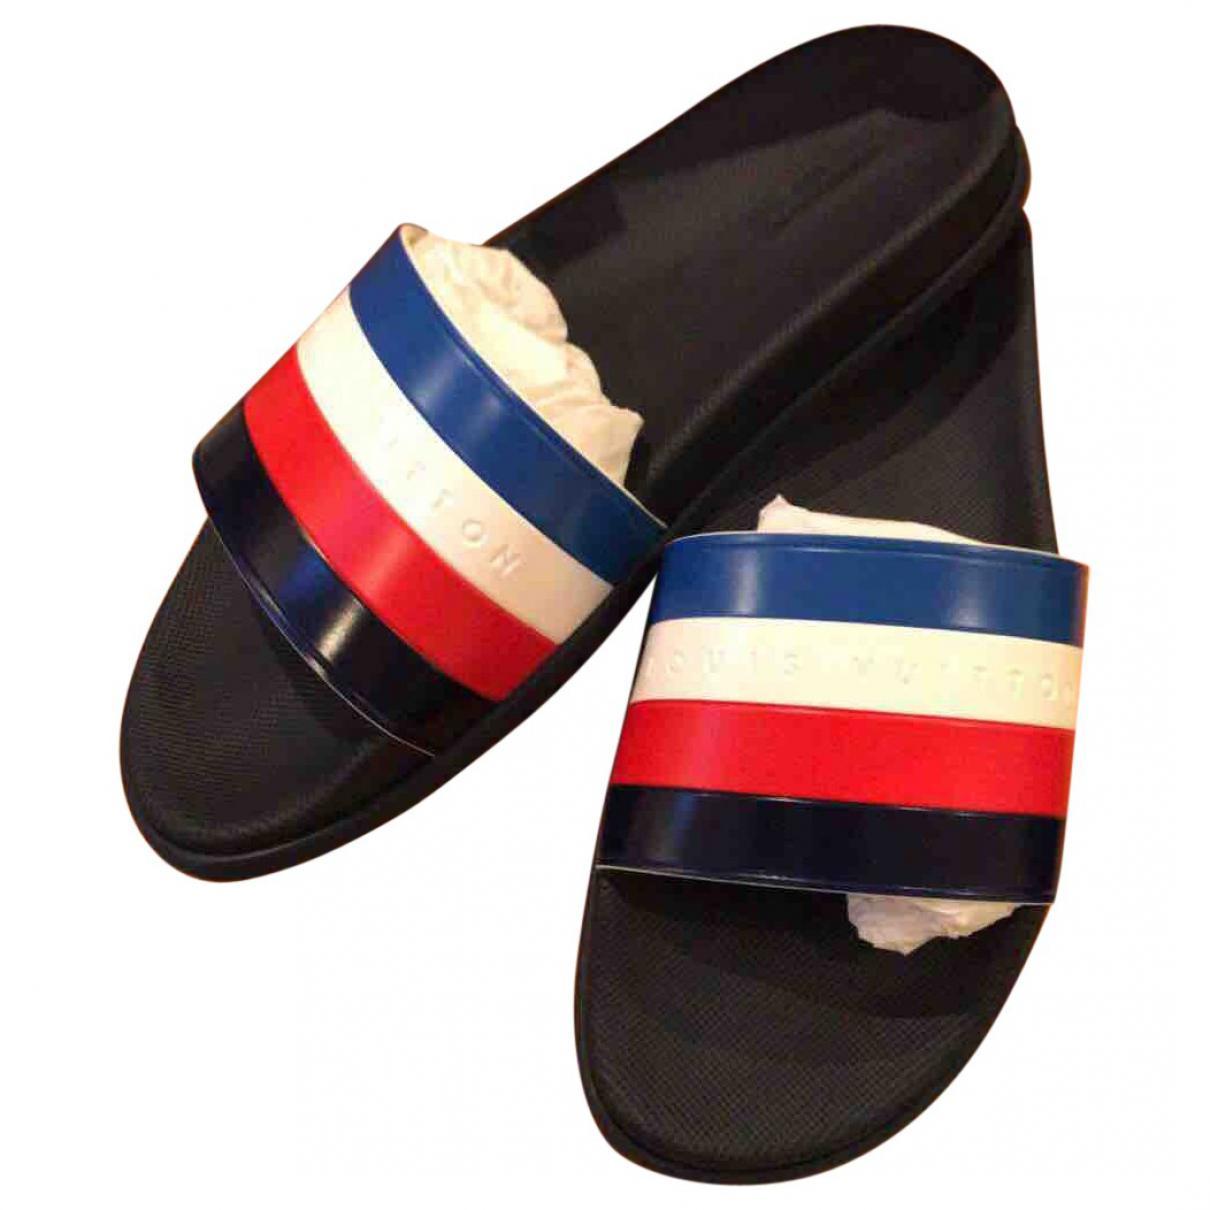 2a3da378169a Louis Vuitton Pre-owned Sandals in Blue for Men - Lyst